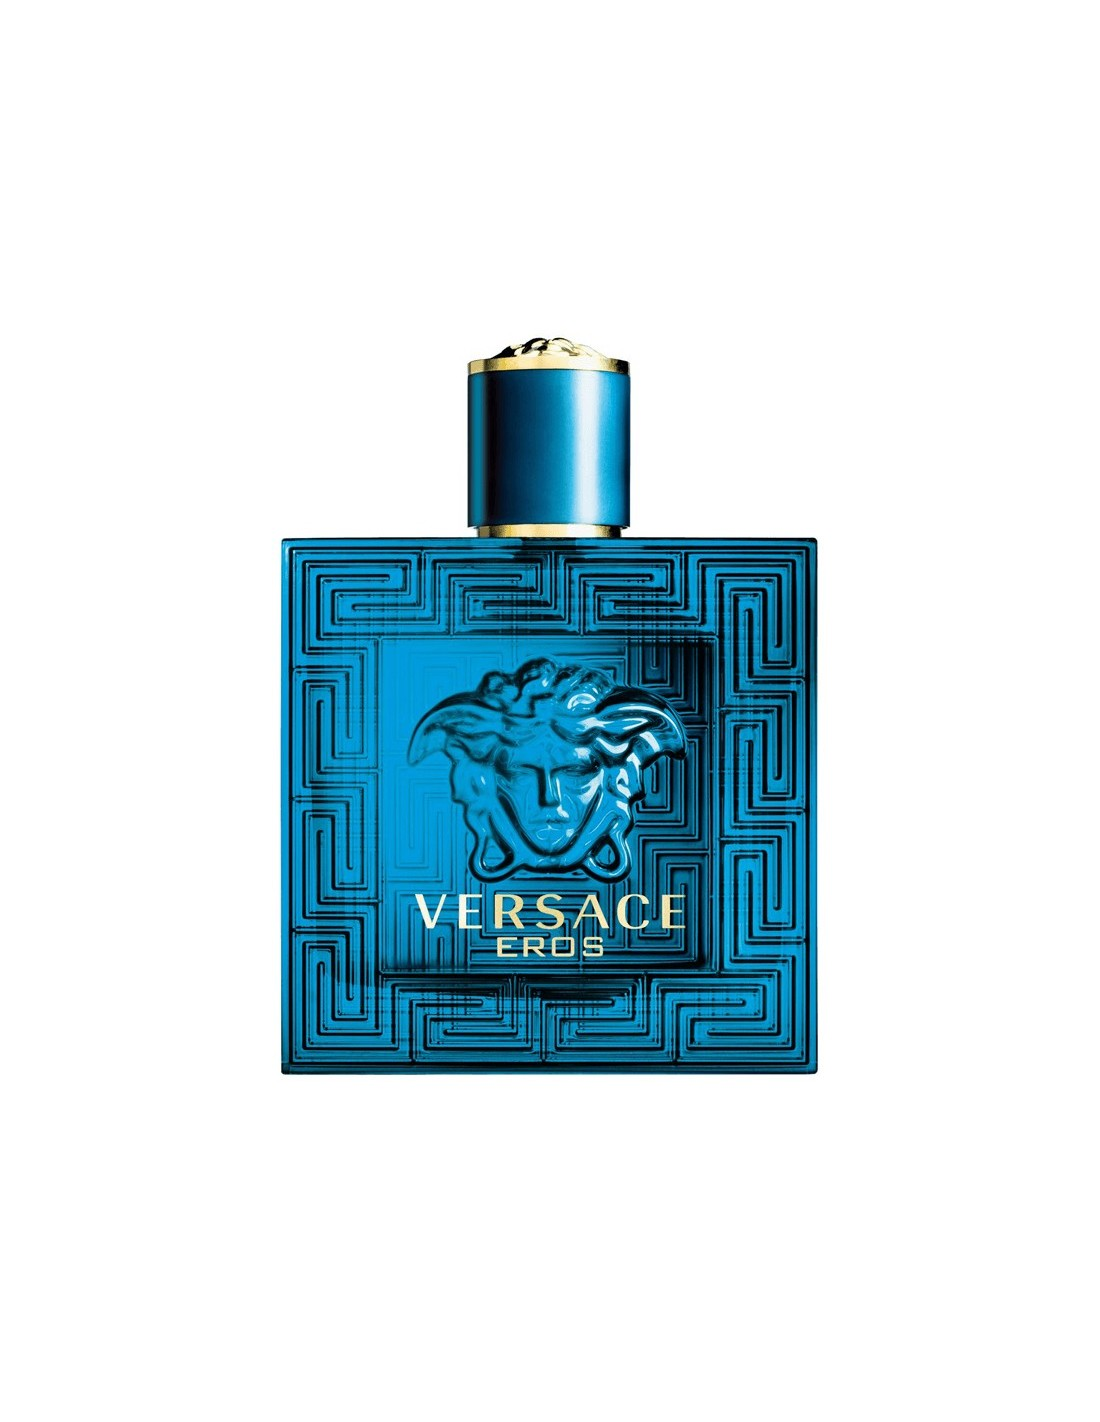 672fee0f7 خرید عطر ورساچه اروس مردانه Versace Eros Pour Homme اصل